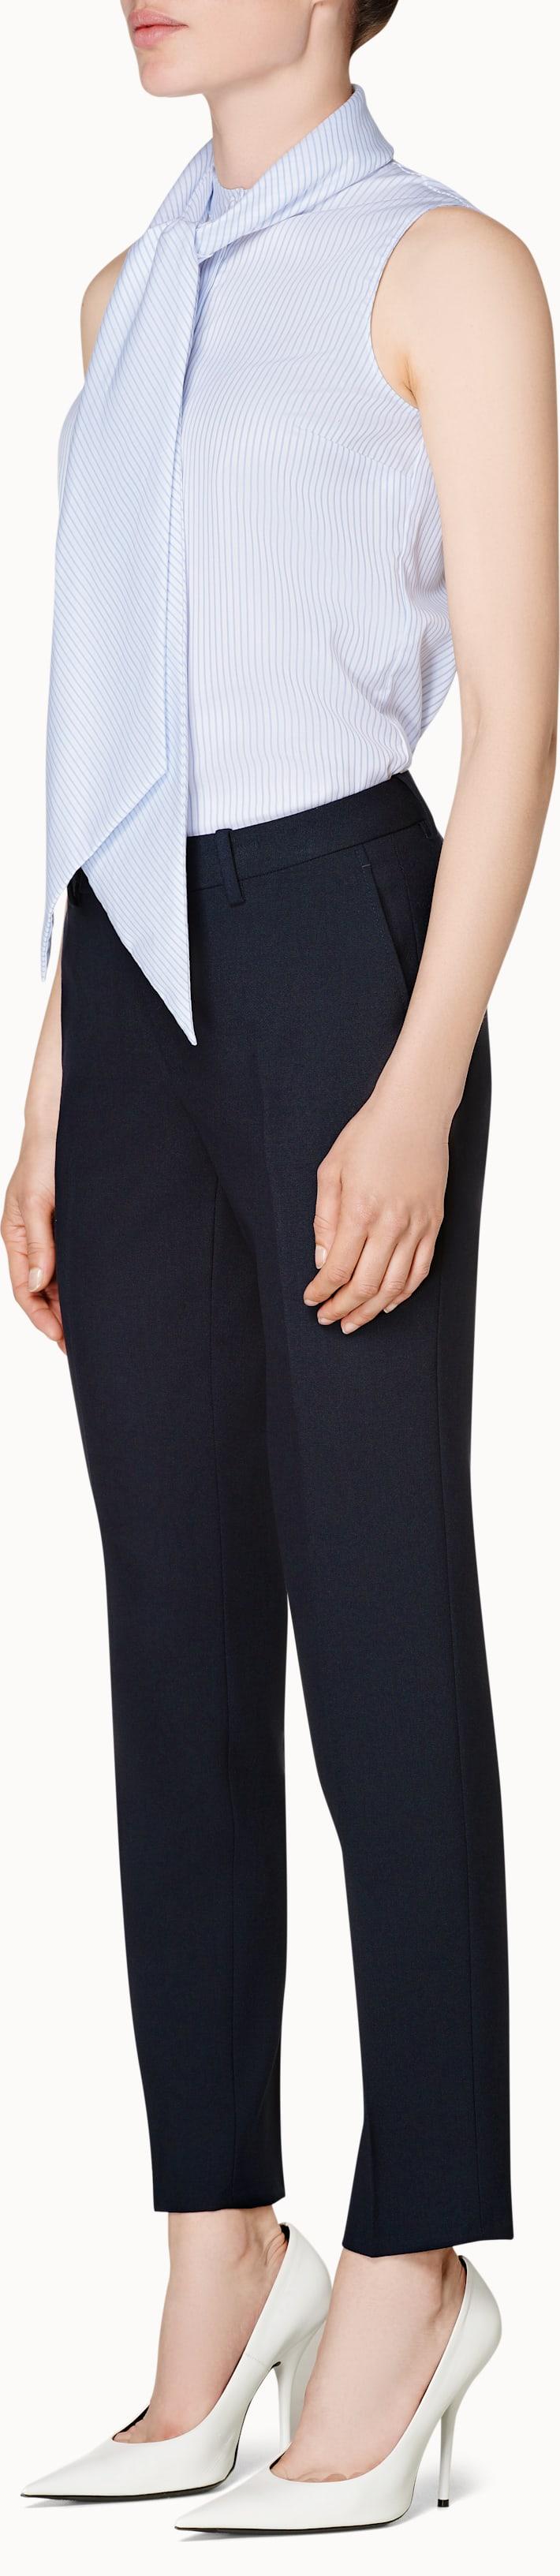 Blue Striped Bow Shirt